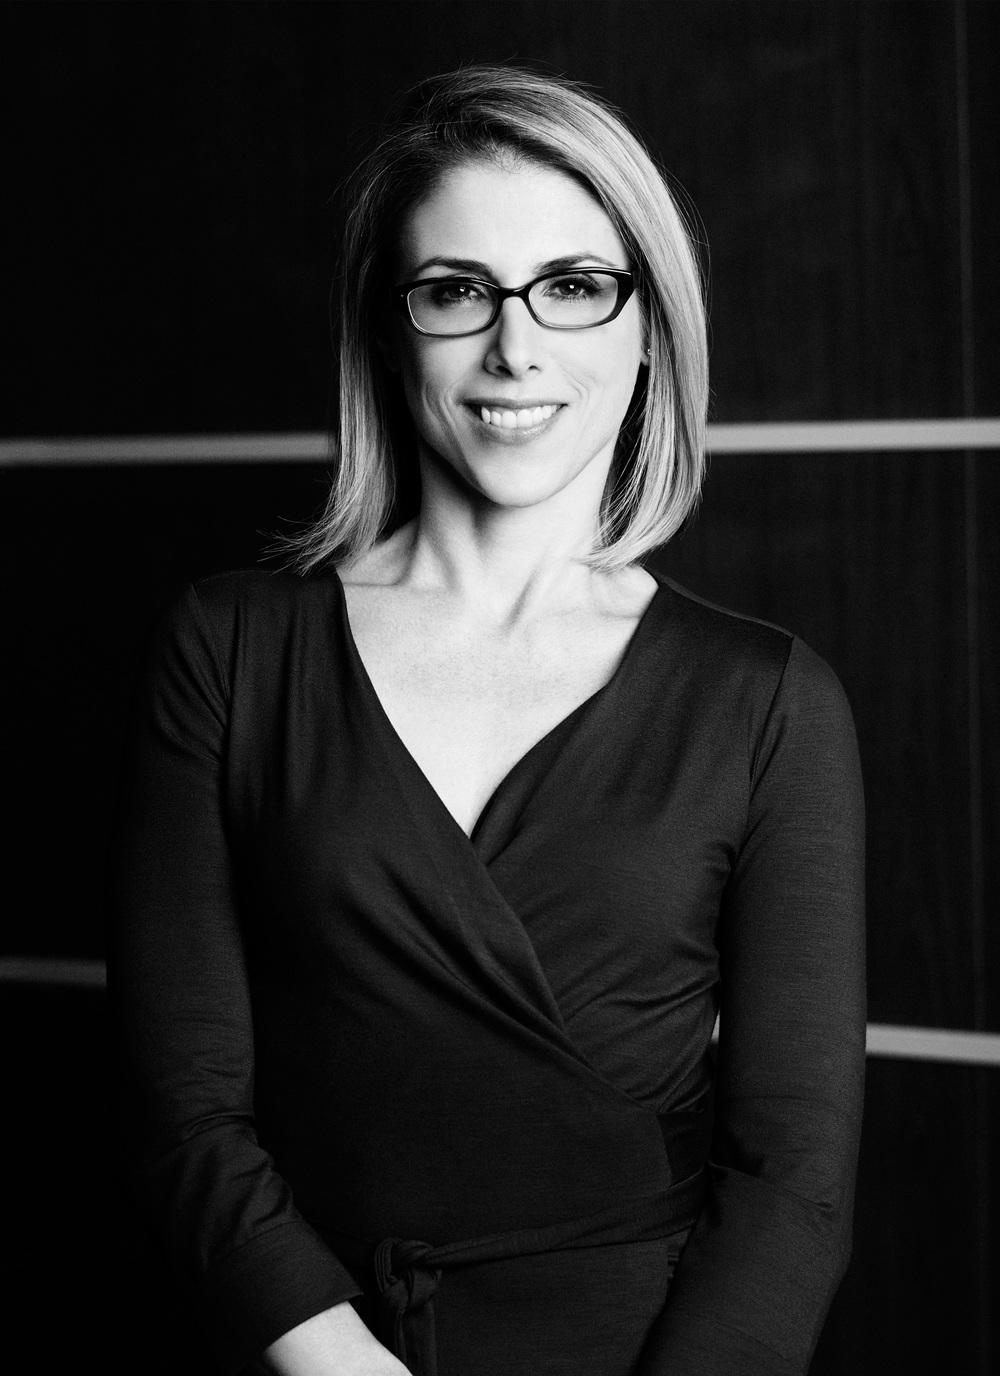 Megan Liberman